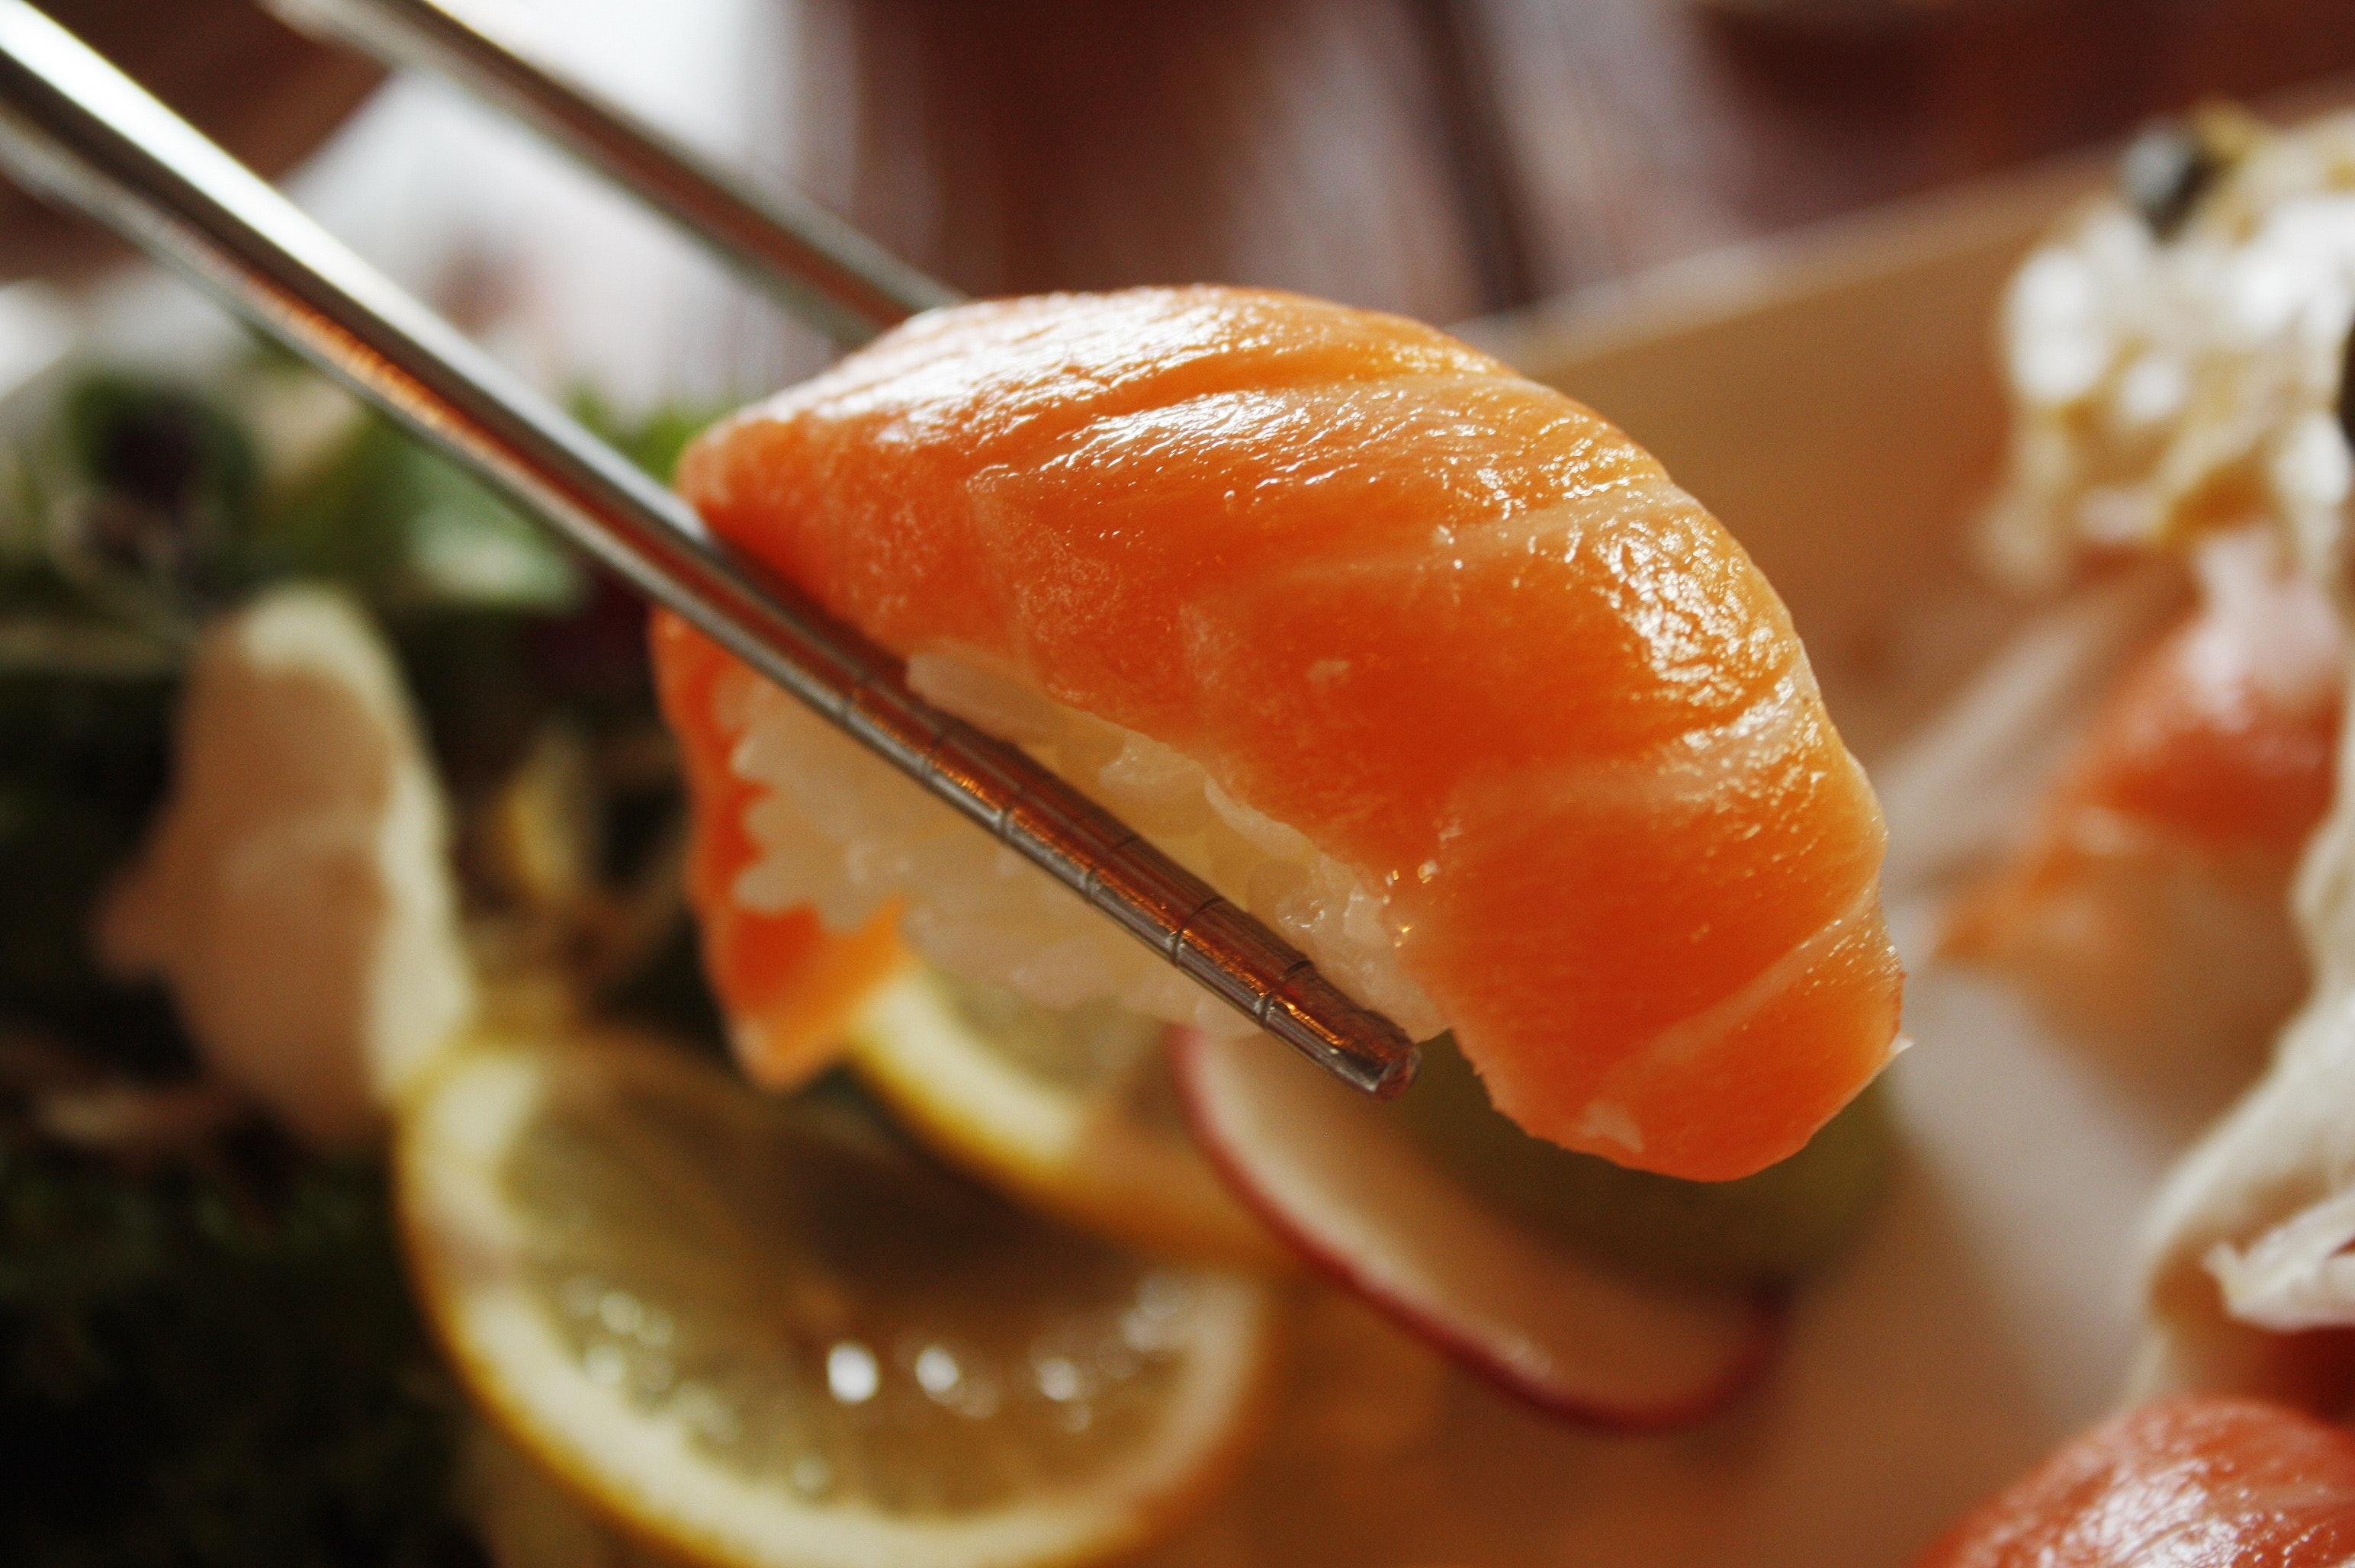 chopsticks-close-up-cuisine-271715